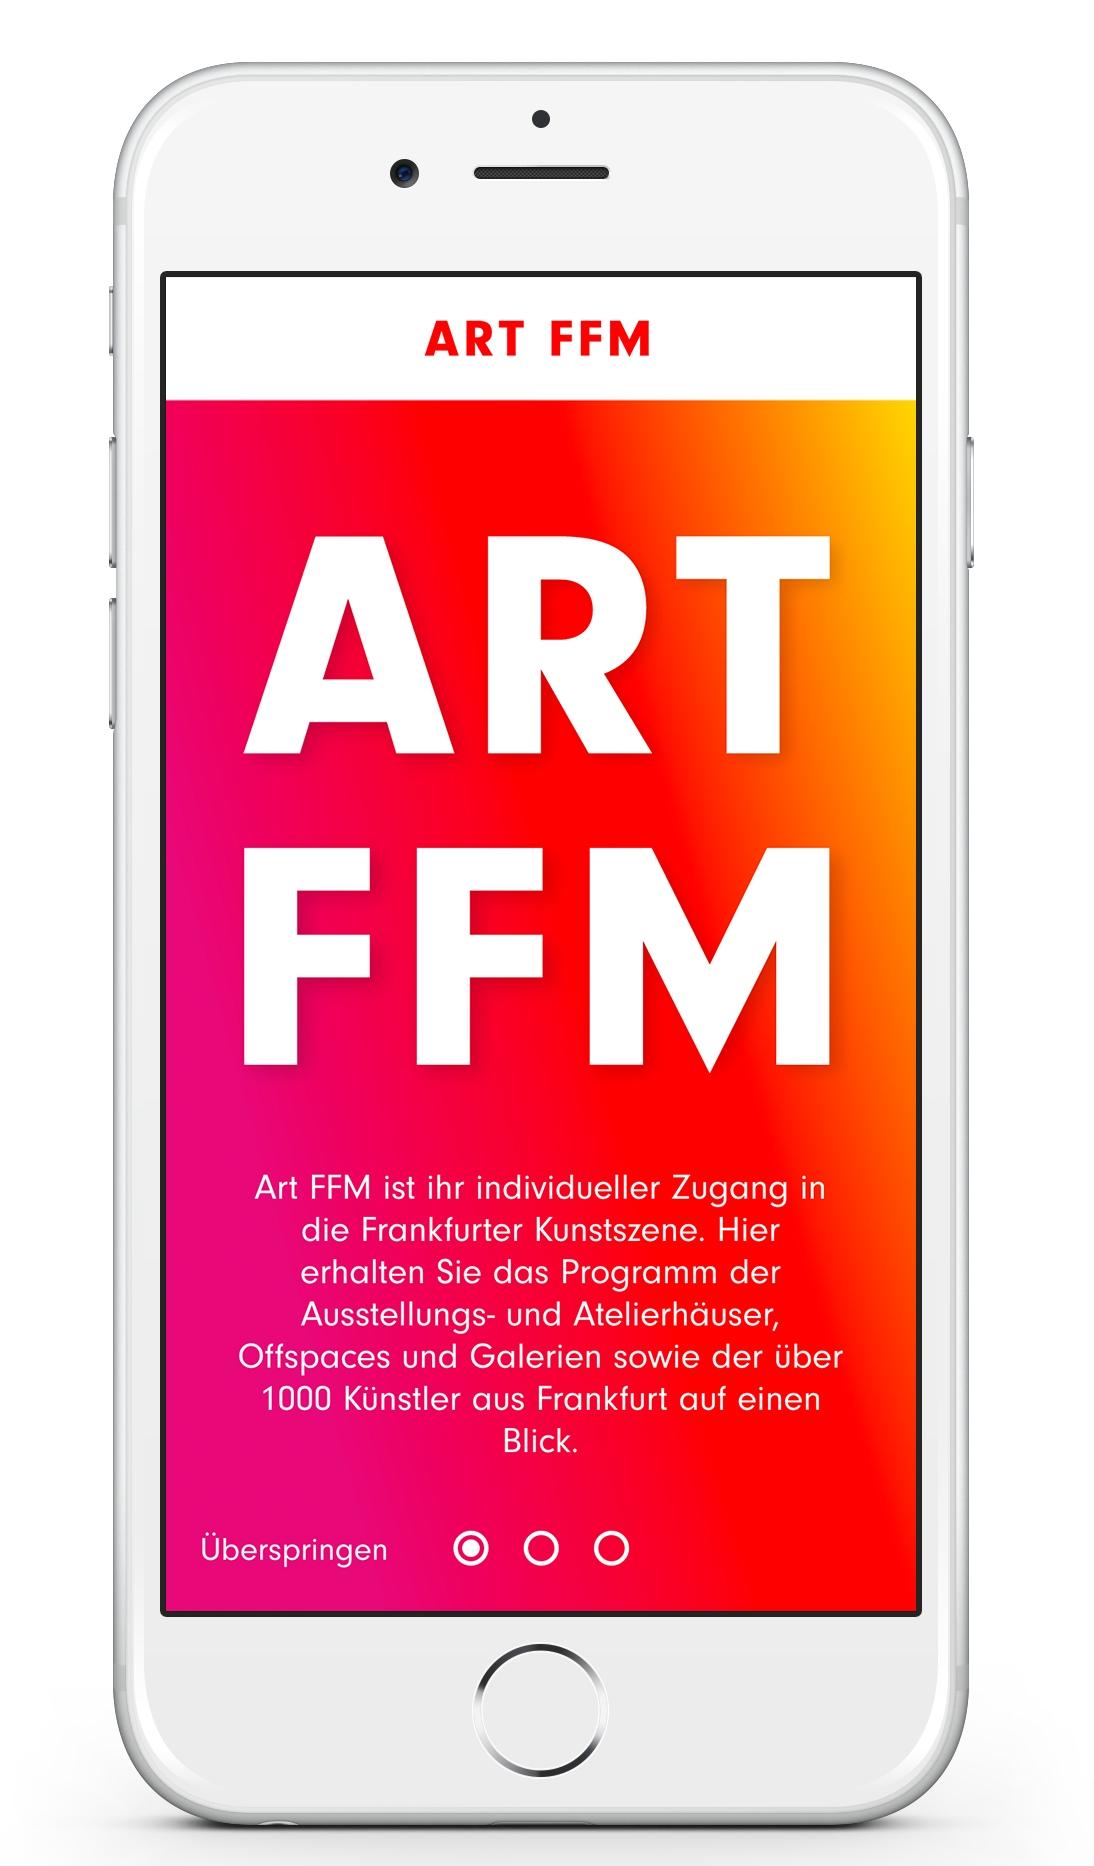 iPhone-6-4,7-inch-Three-colors-Mockup.jpg